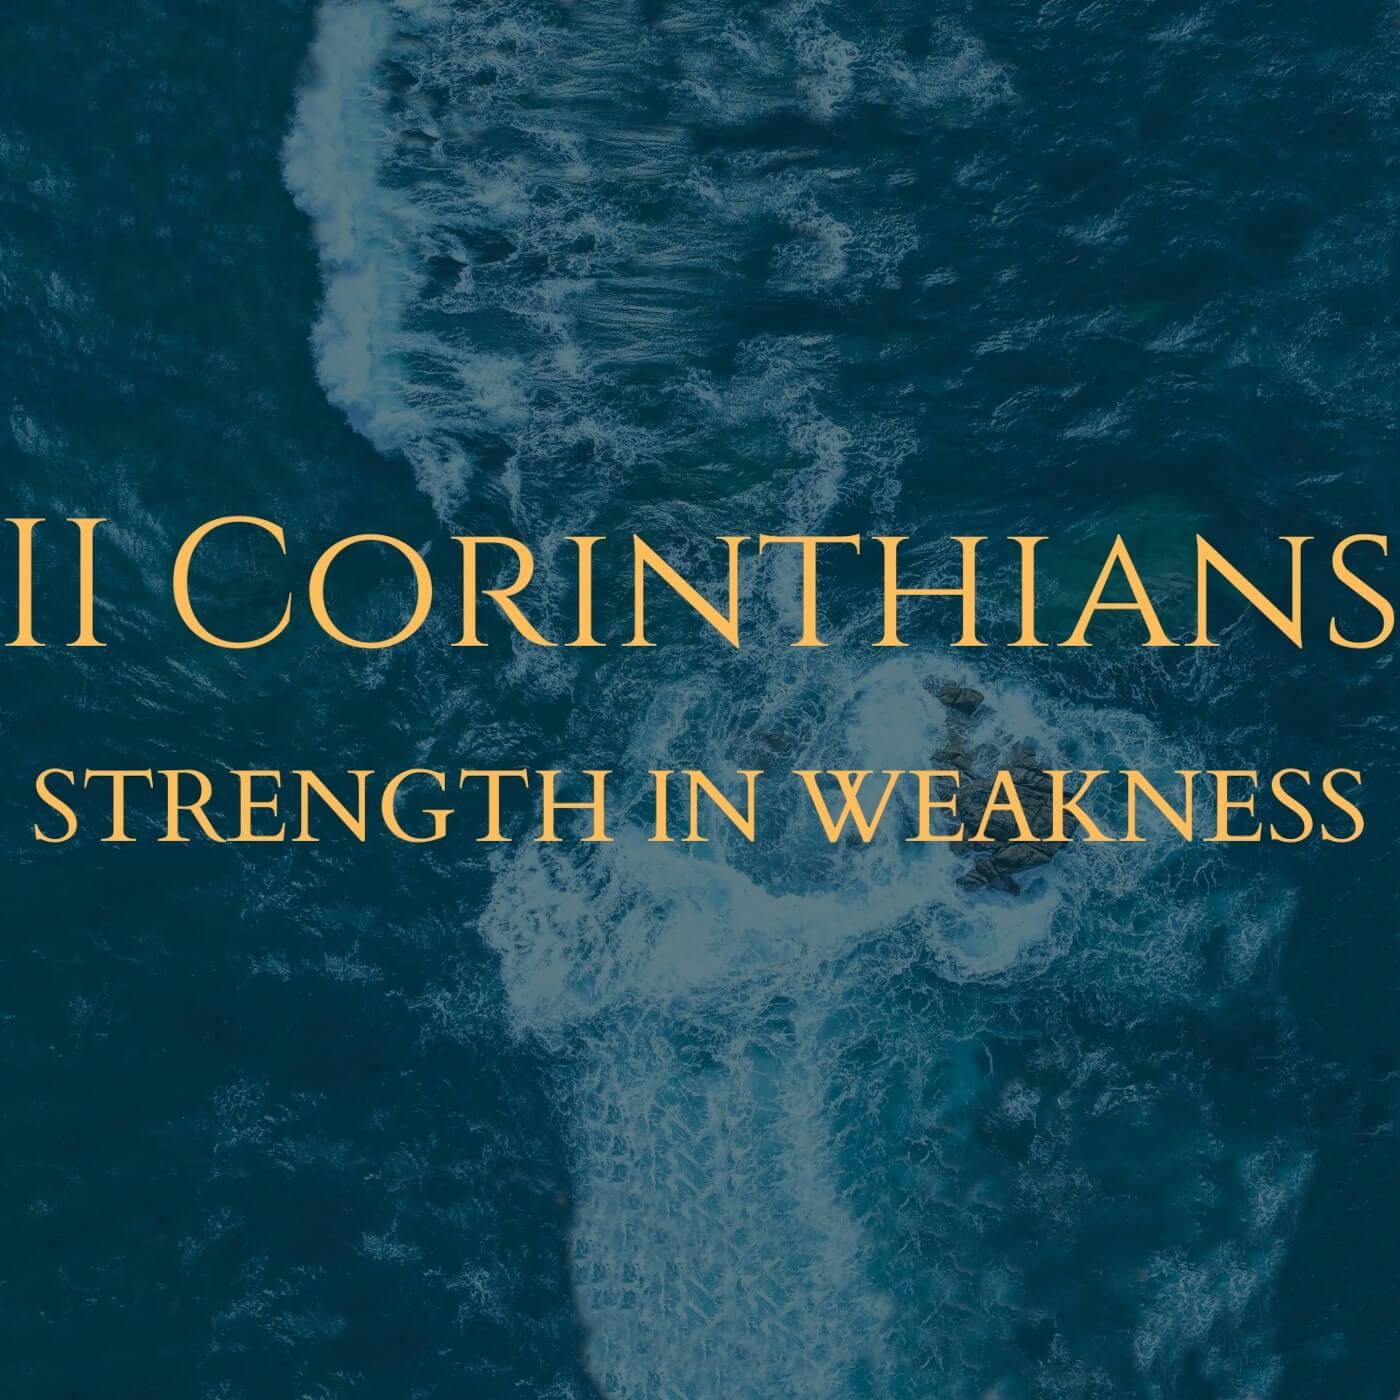 II Corinthians 13:11-14